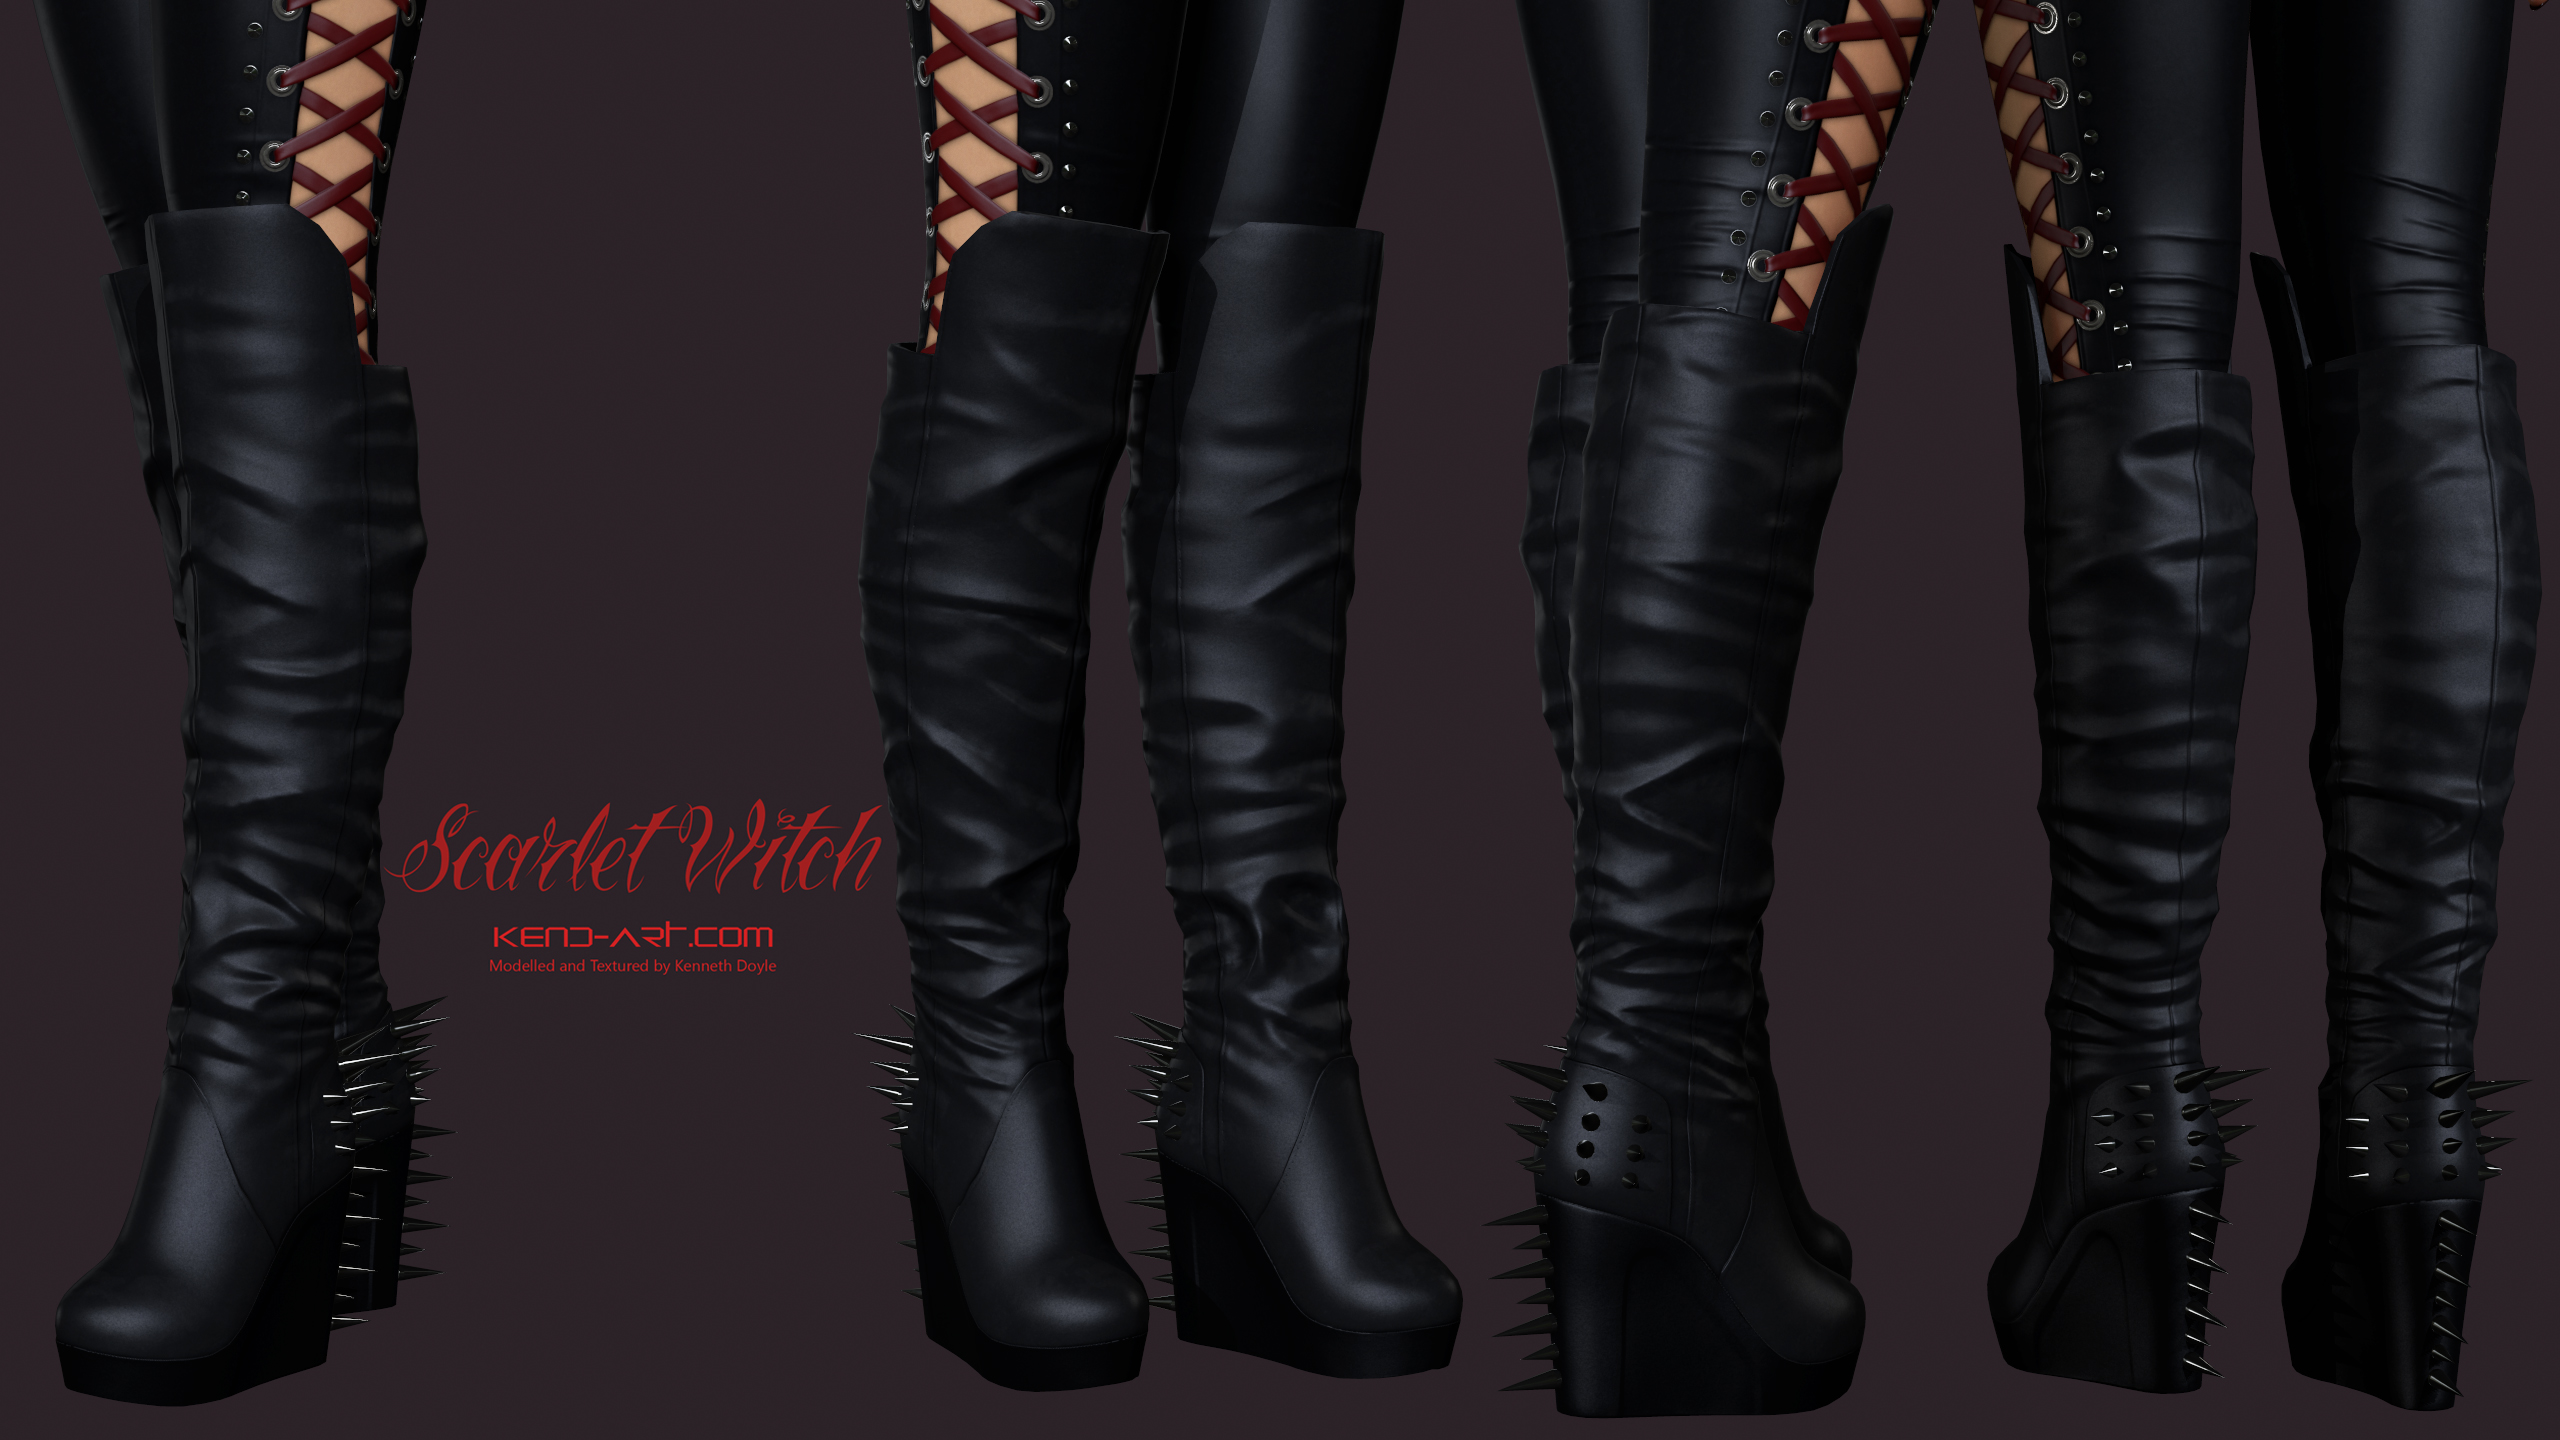 scarlet_witch_boots_by_kdoyle9-d953bw8.jpg